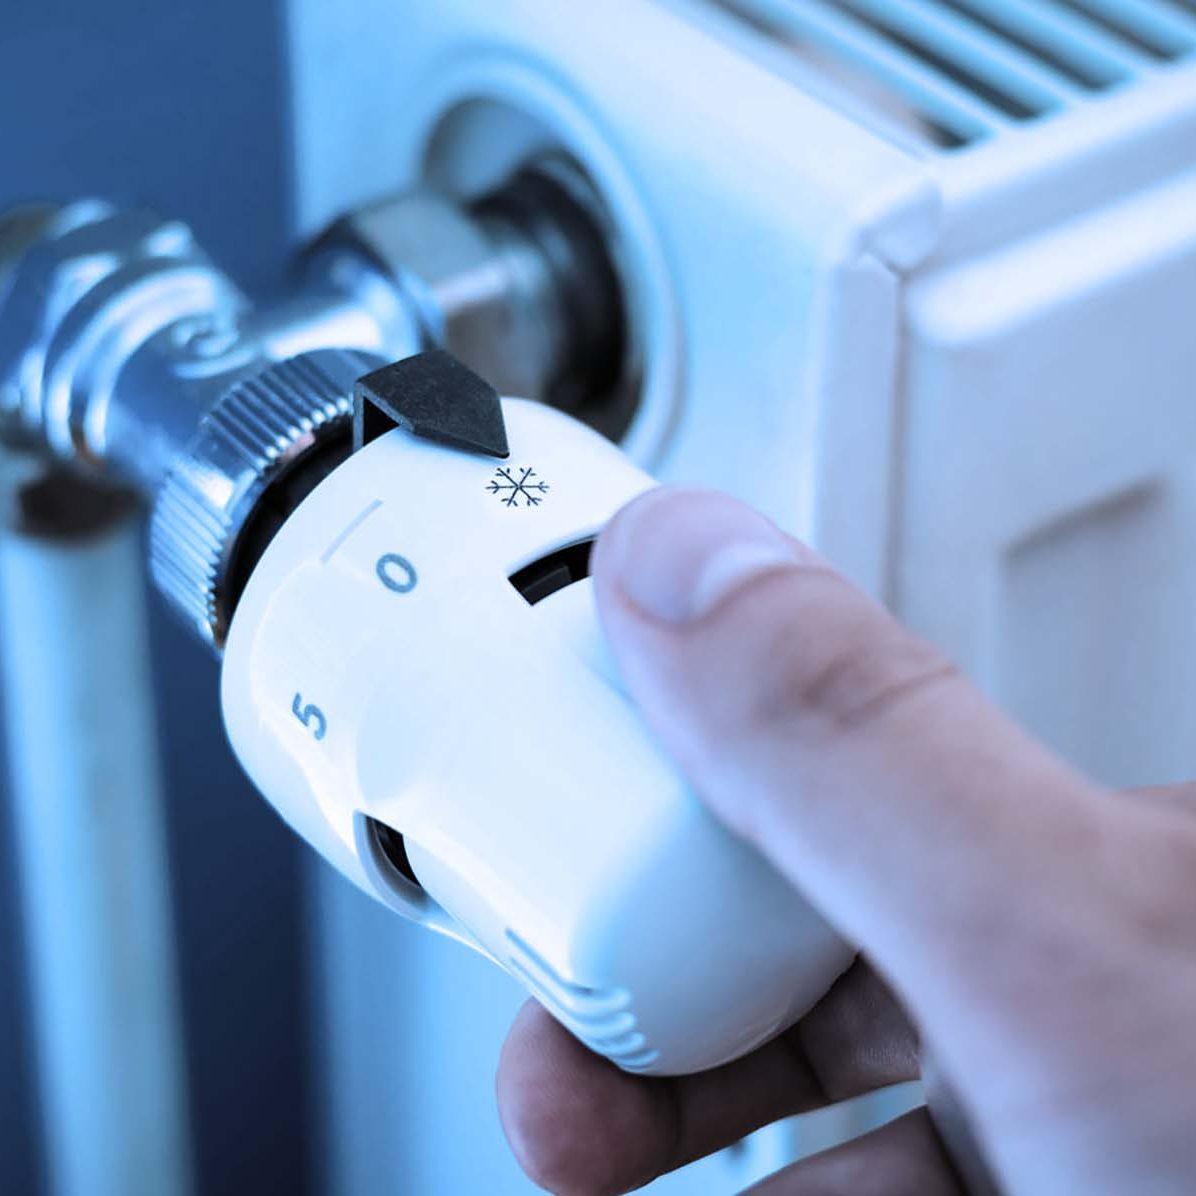 One hand adjust thermostat valve close up